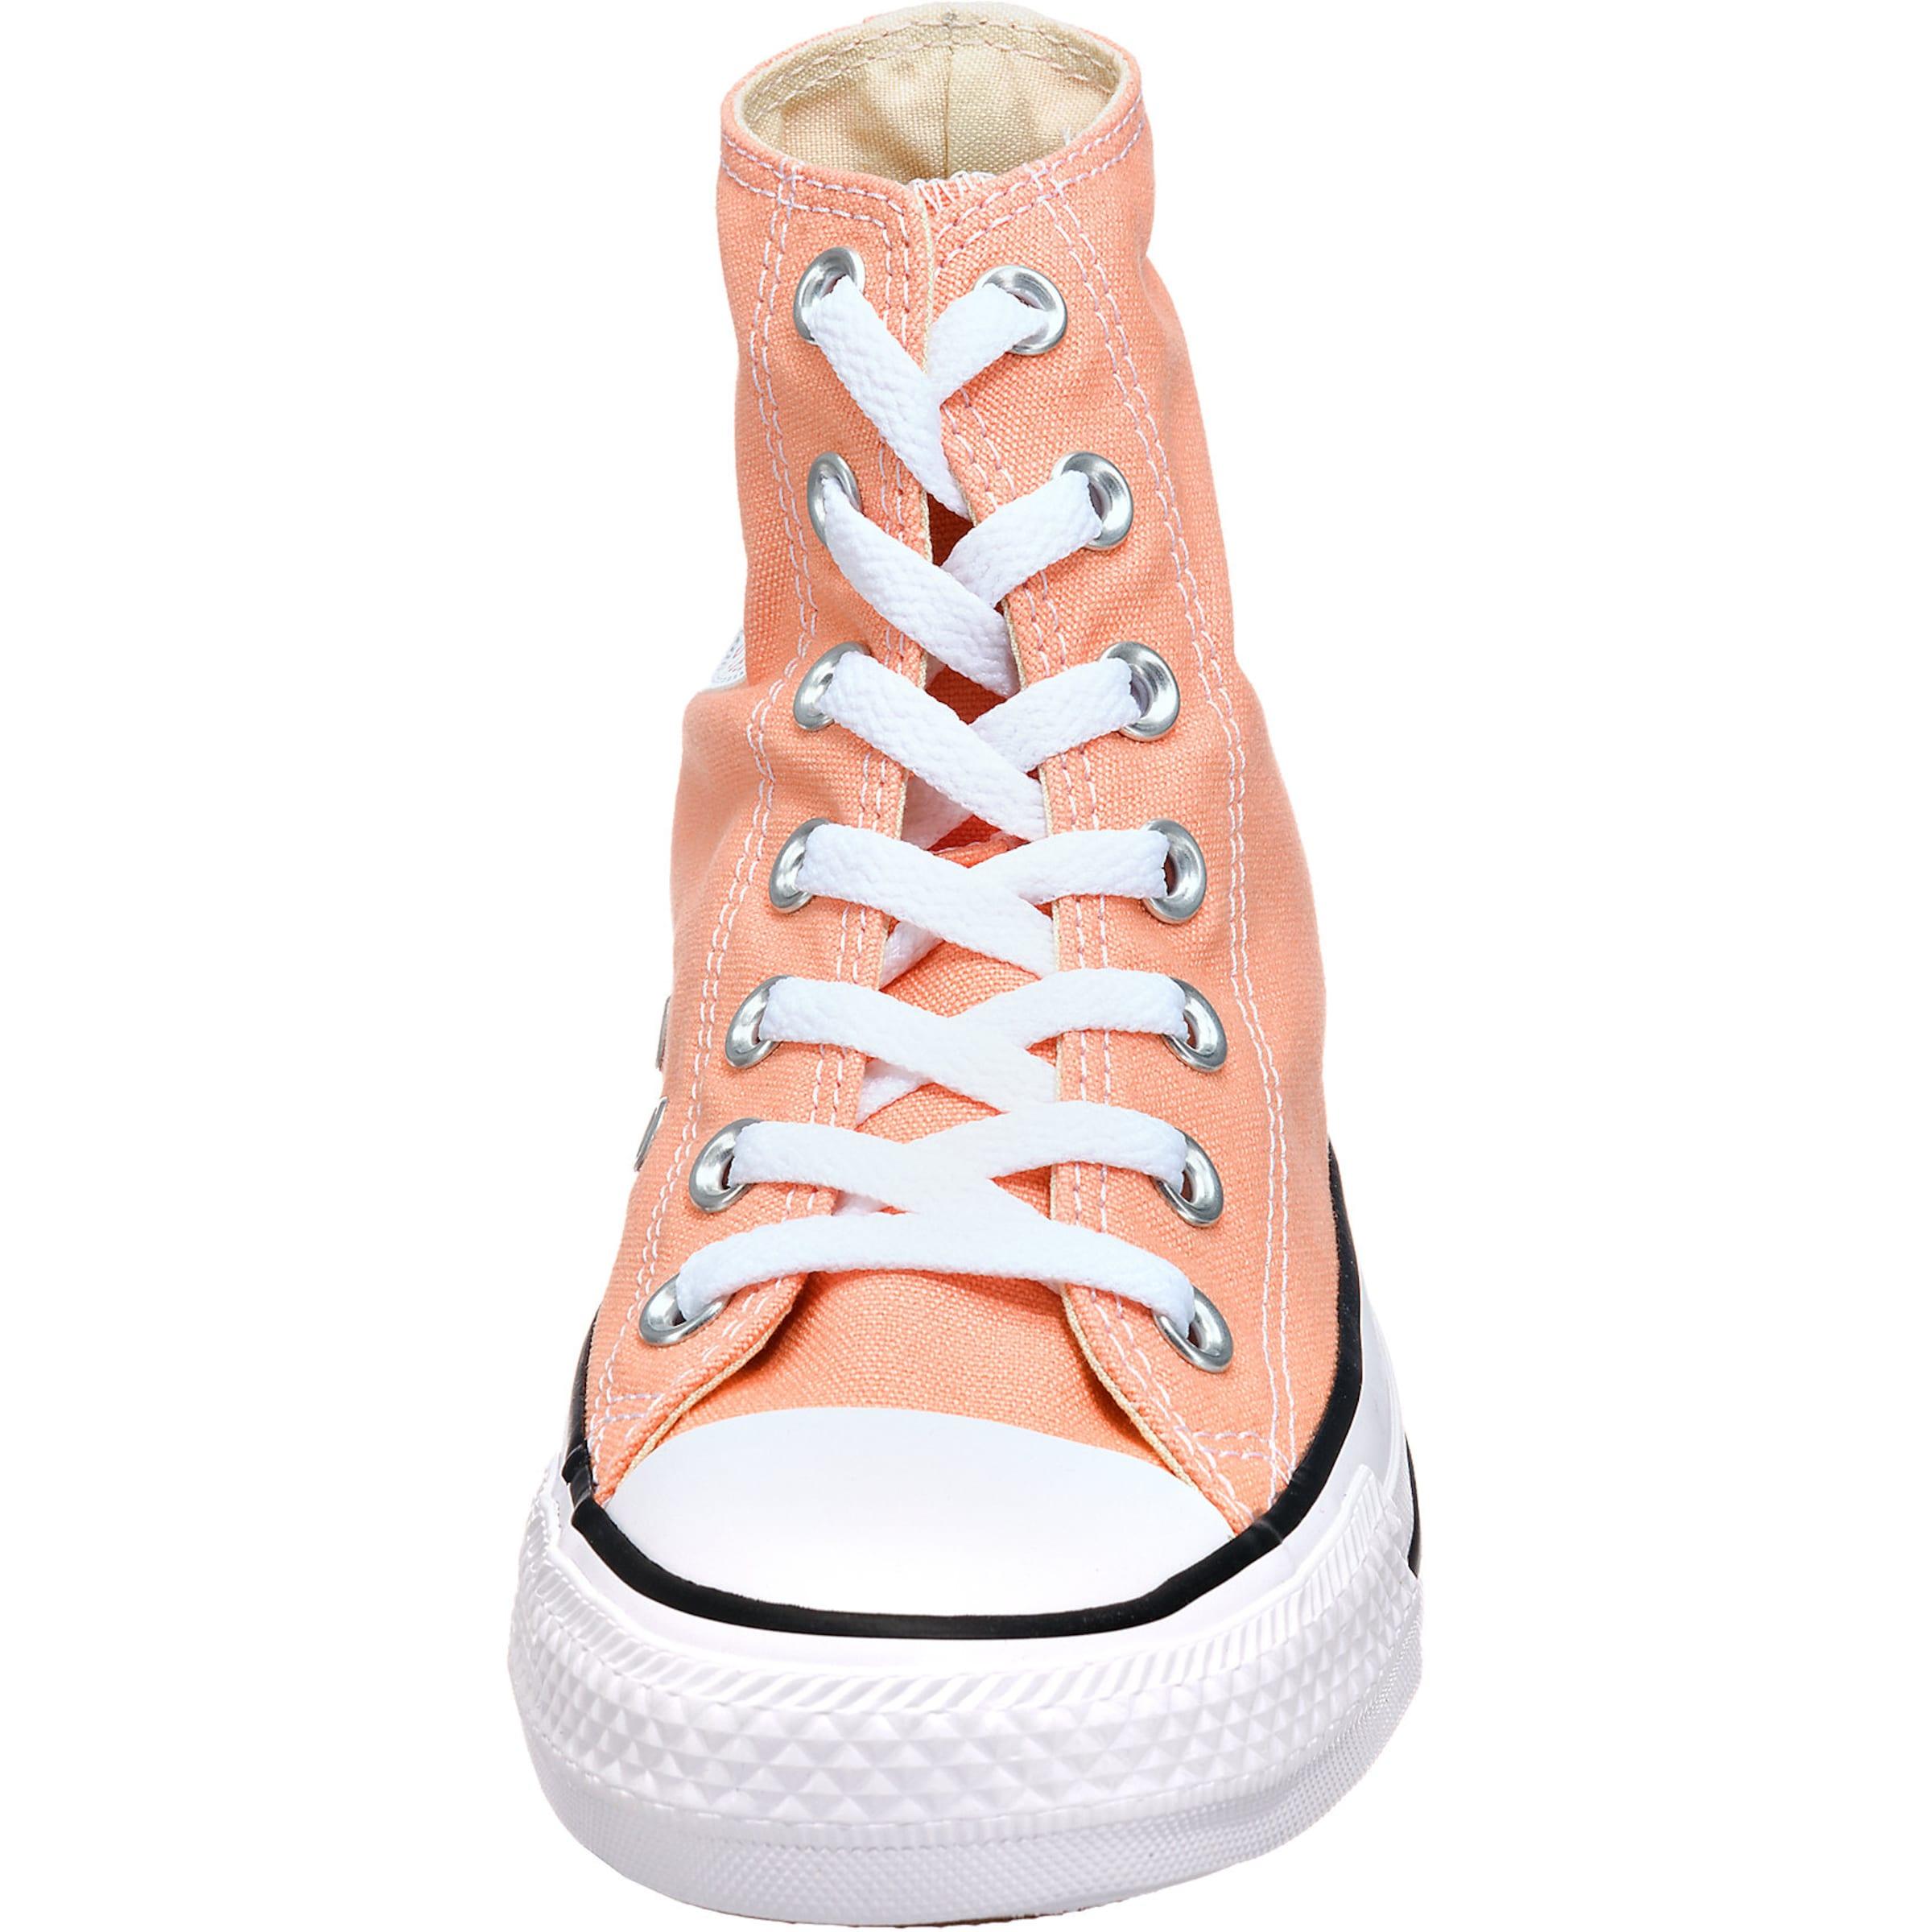 CONVERSE Sneaker 'Chuck Taylor All S' Größte Anbieter Günstiger Preis Billig Mit Master Freies Verschiffen Neuestes 1qeQr